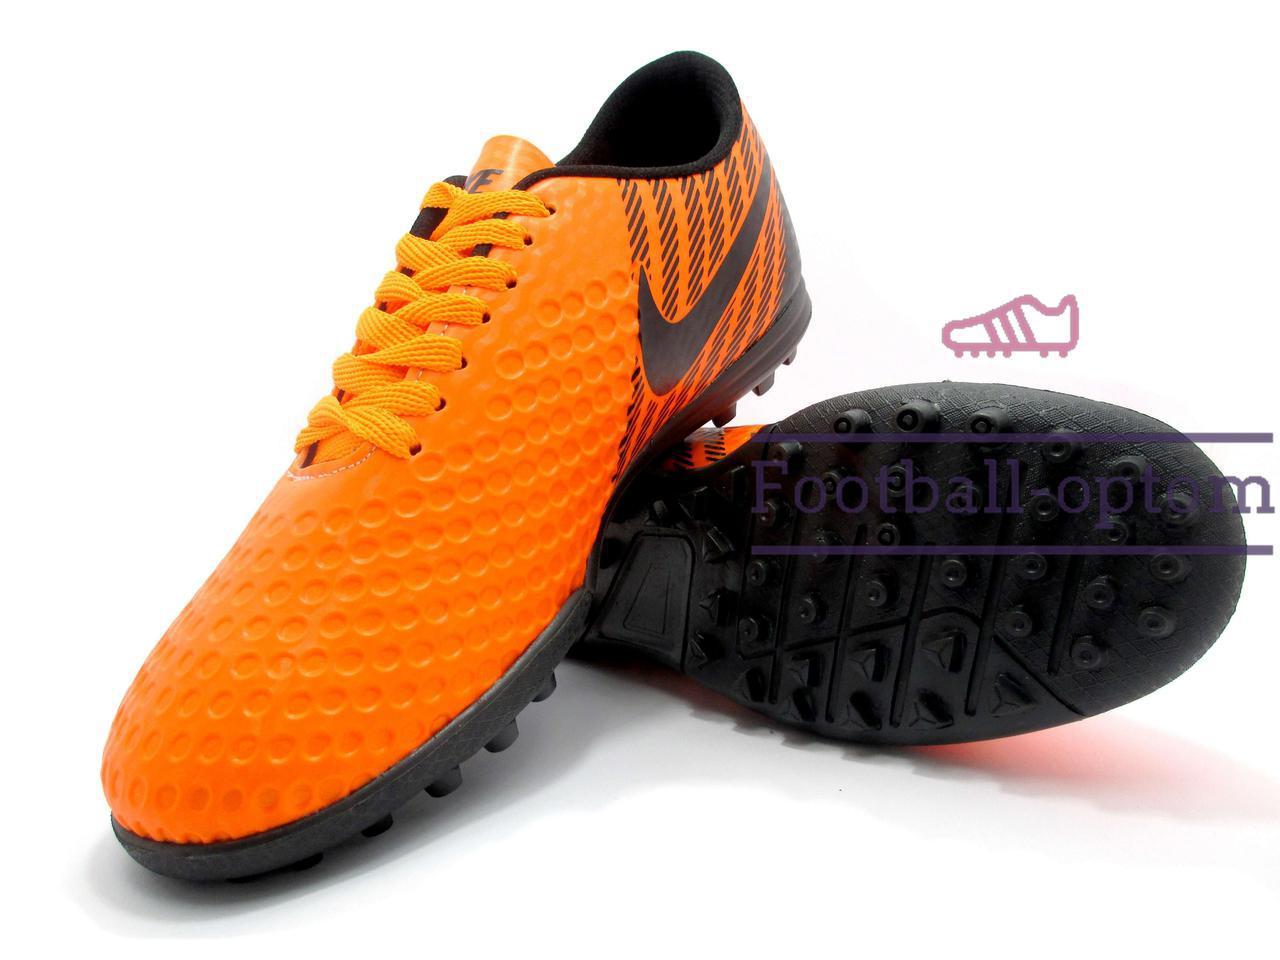 Купить Сороконожки (многошиповки) Nike Magista в Днепре от компании ... 24f2f10c2d2e1